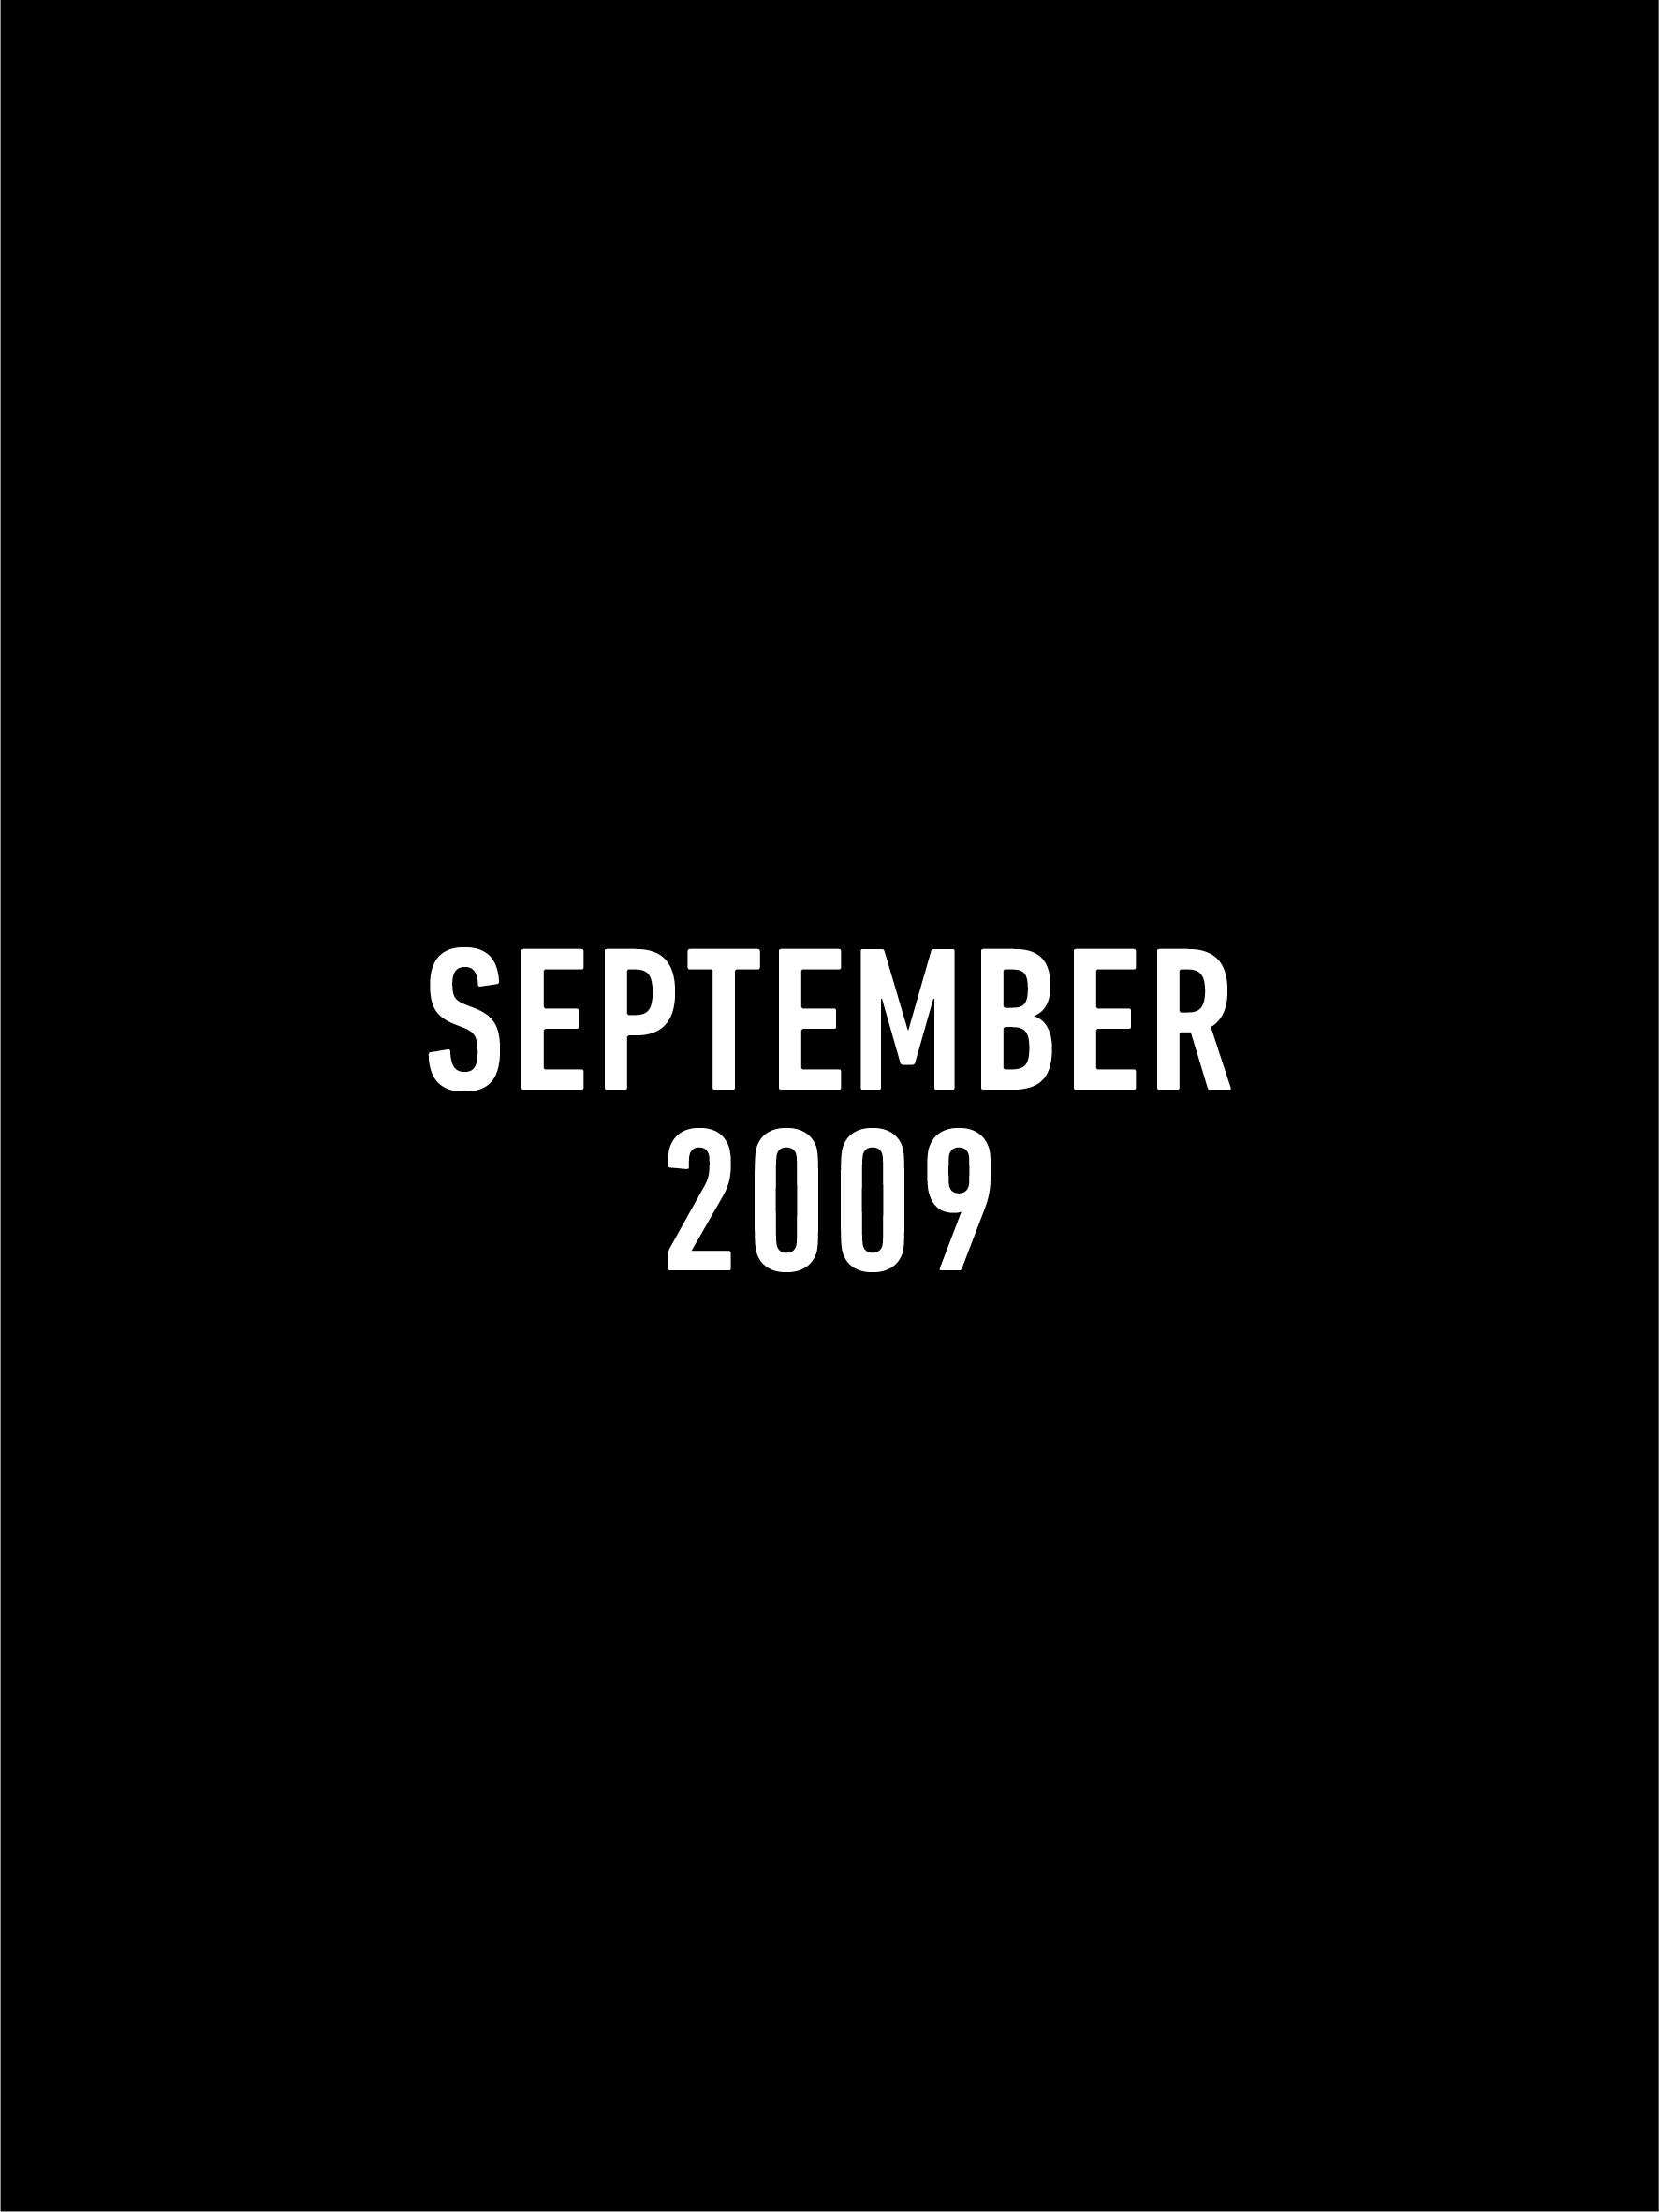 2009 monthly9.jpg